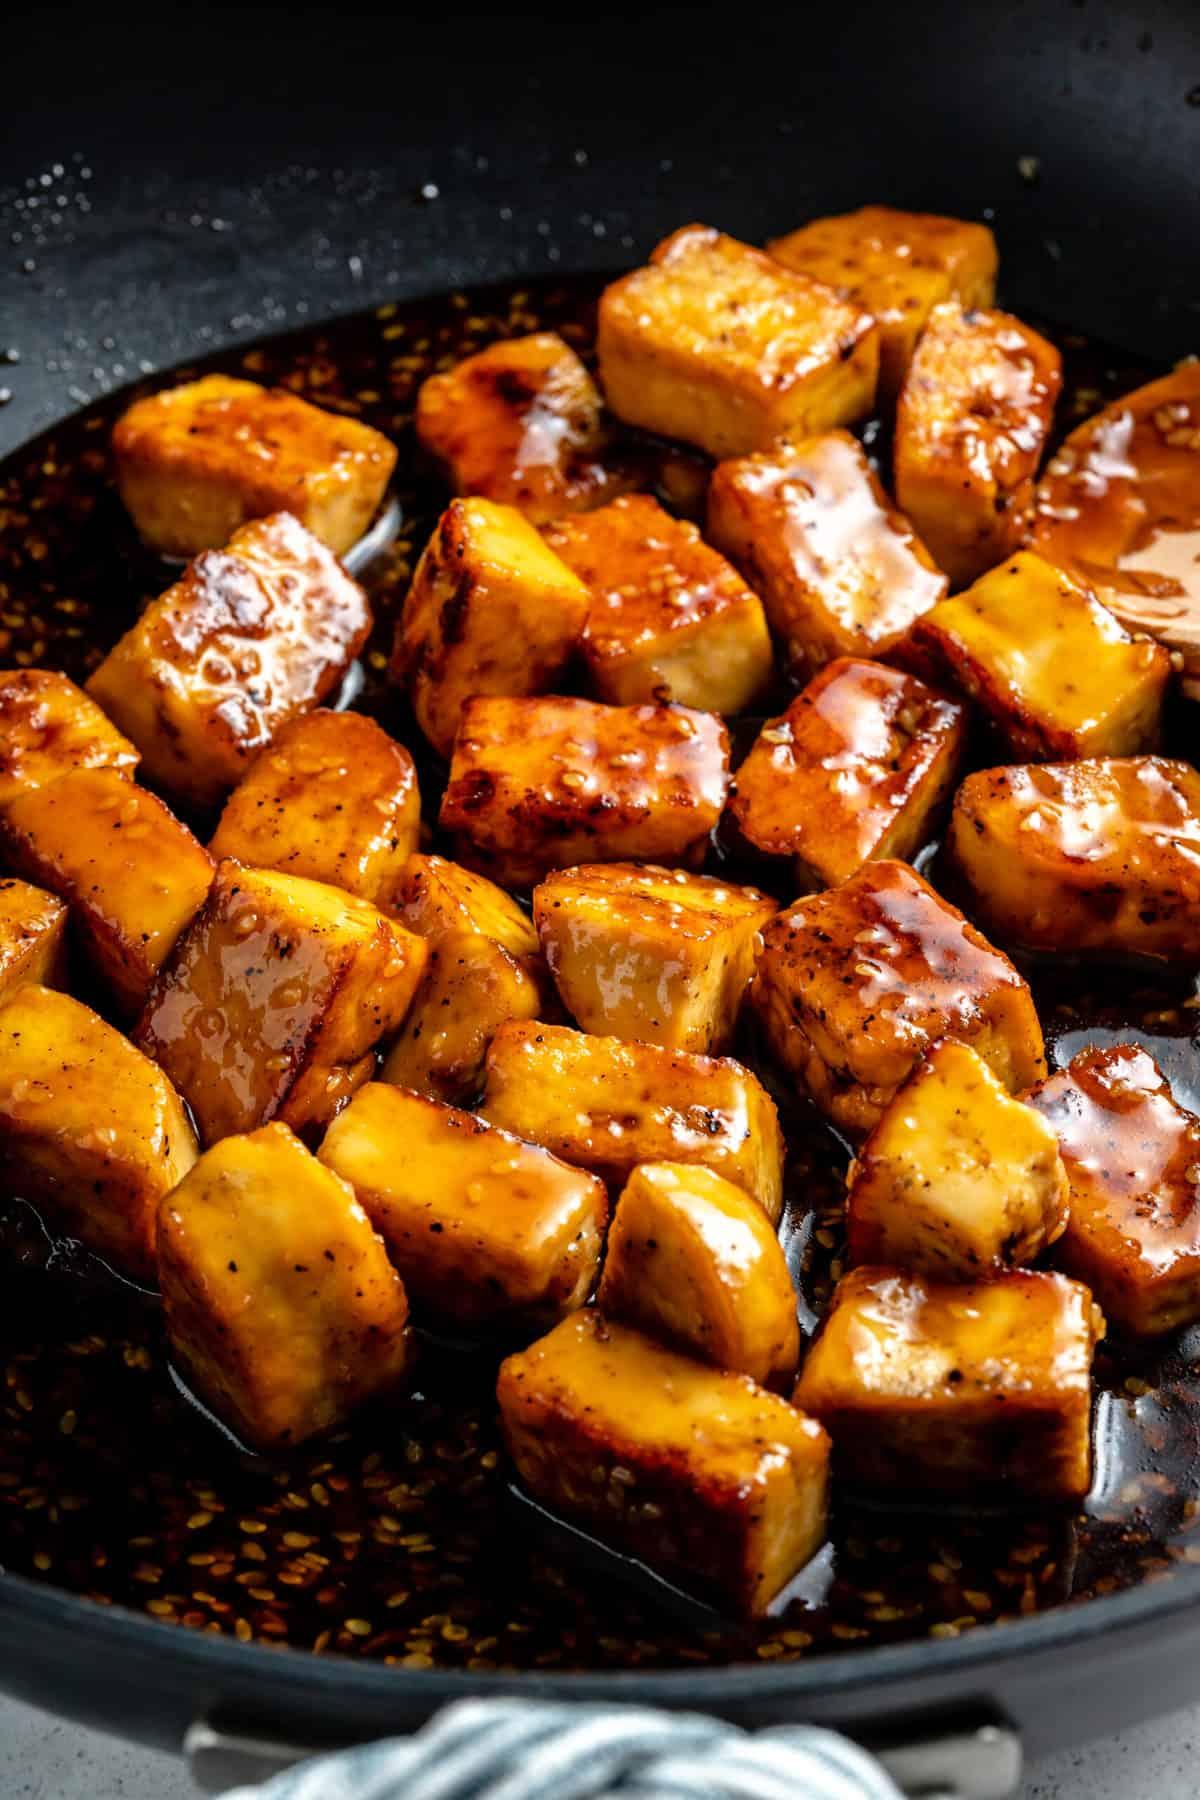 Teriyaki tofu cooking in a frying pan.